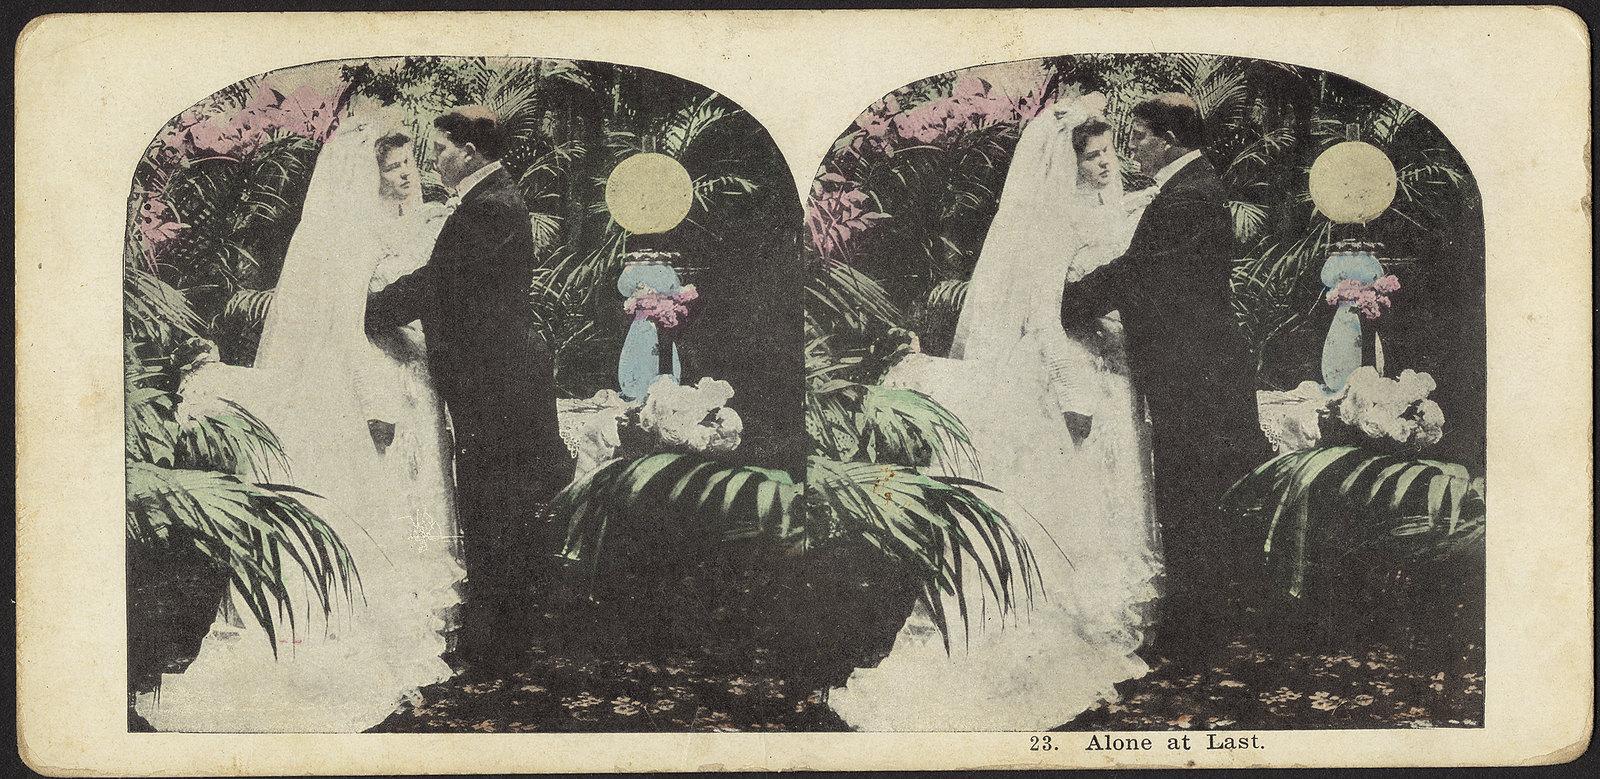 Alone at last    c. 1850-1920   stereograph (photomechanical print)